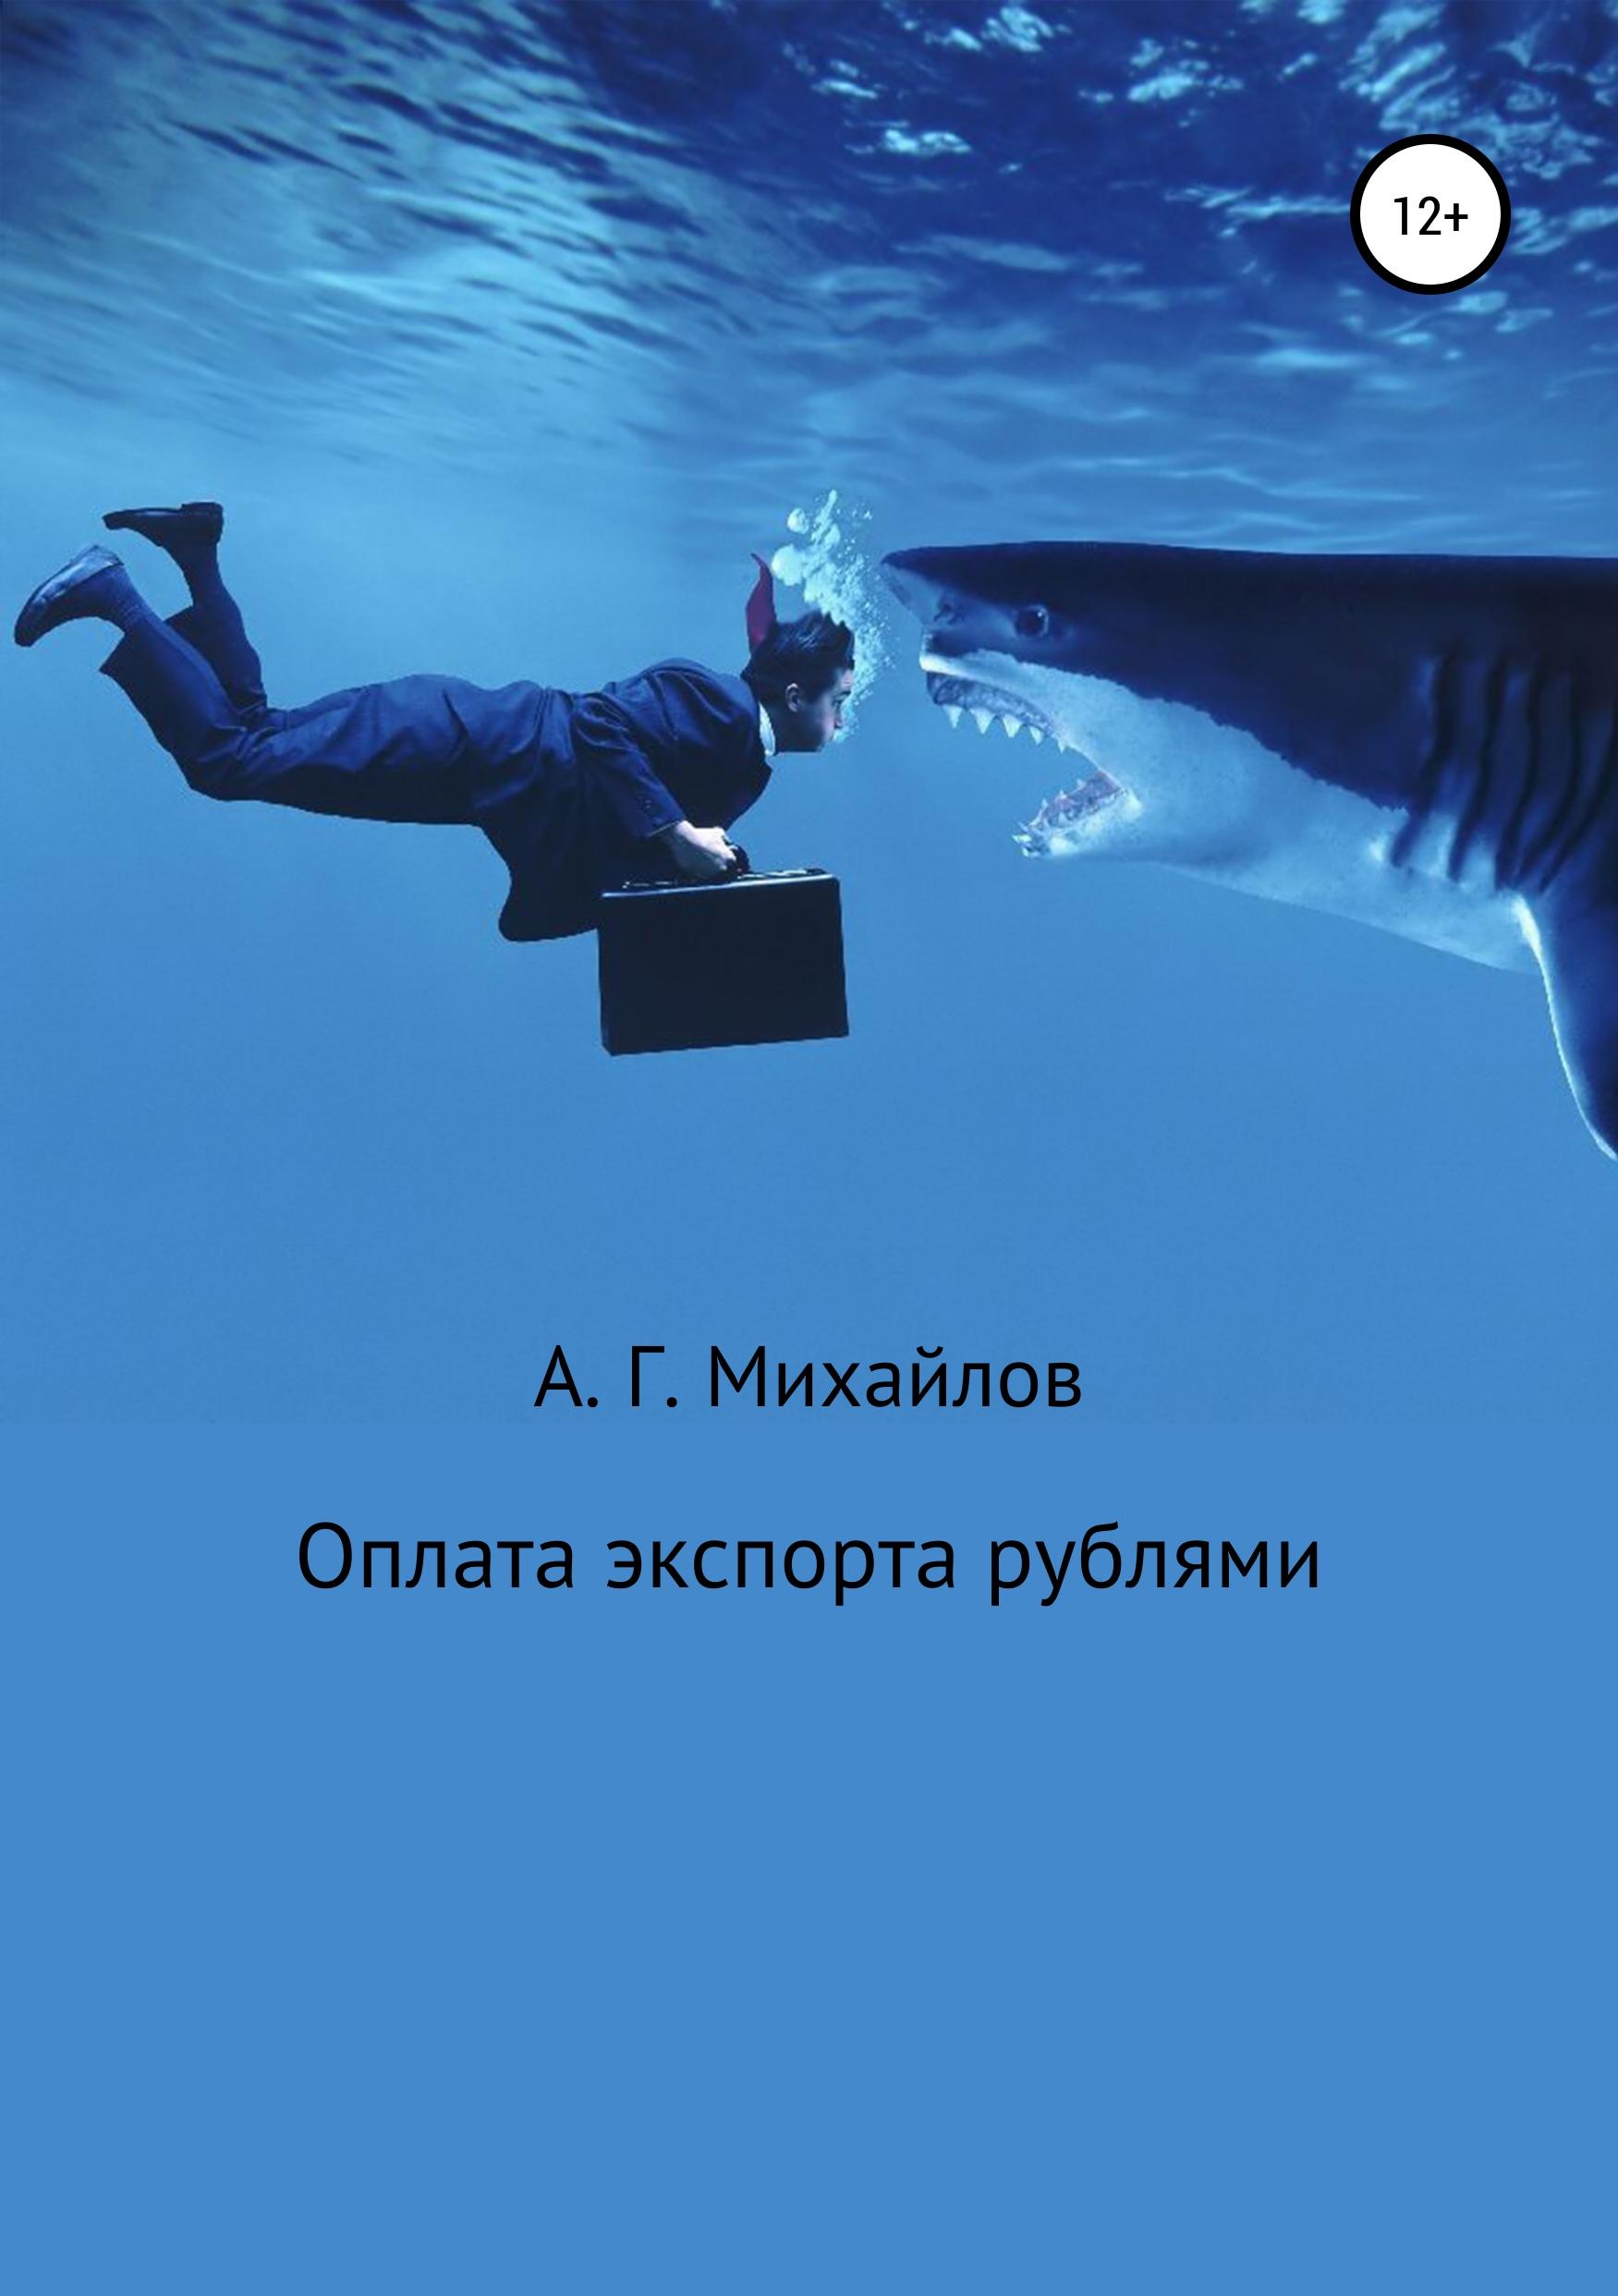 Александр Григорьевич Михайлов Оплата экспорта рублями